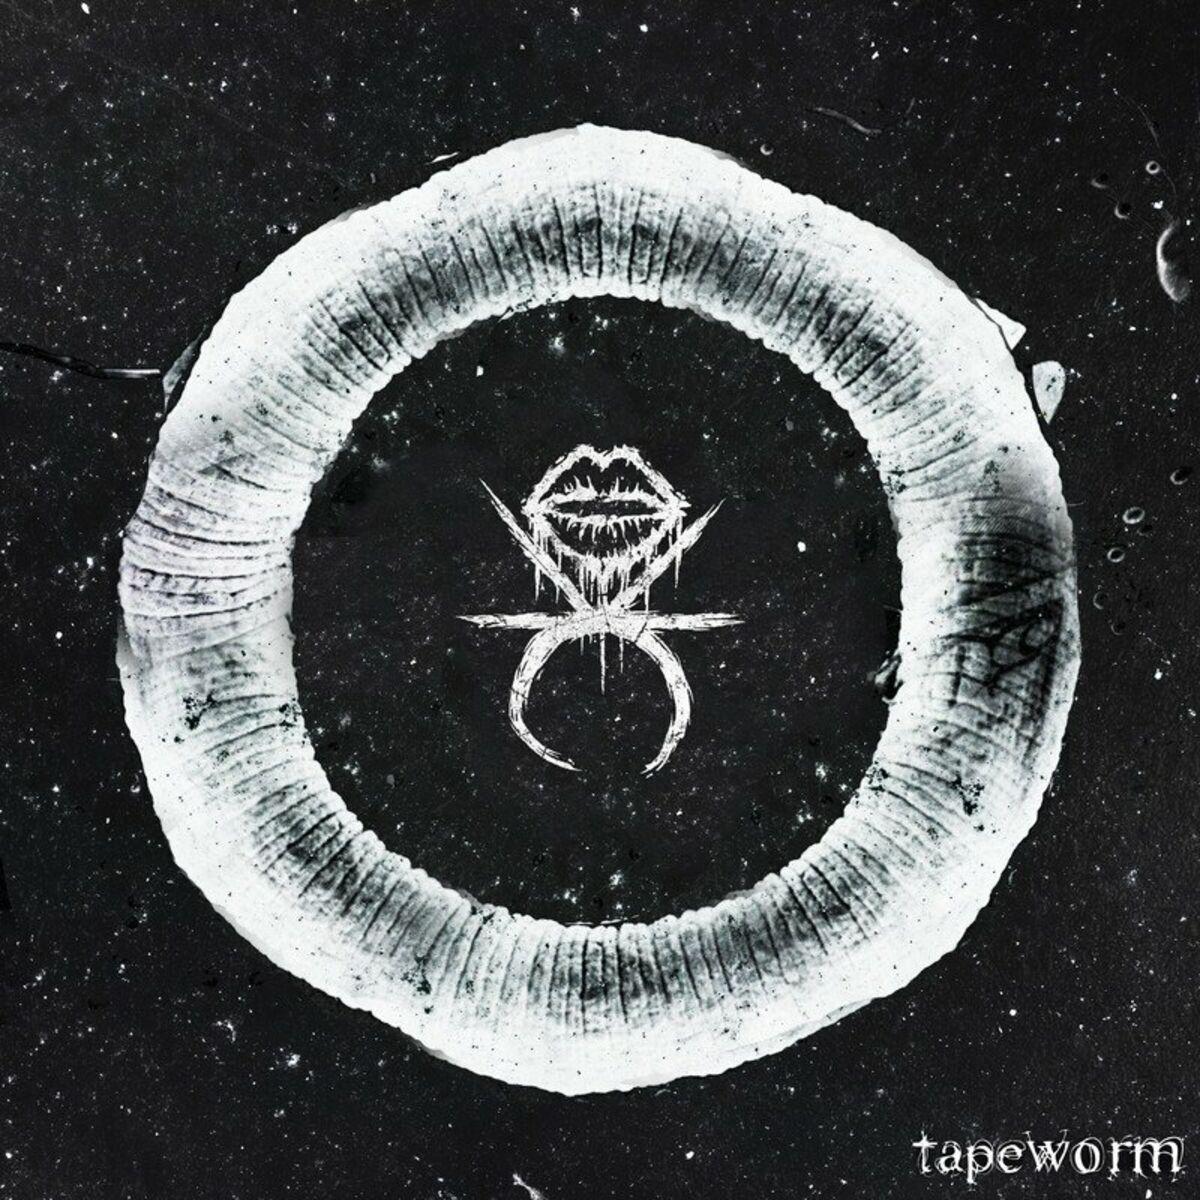 Kissing Candice - Tapeworm [single] (2020)